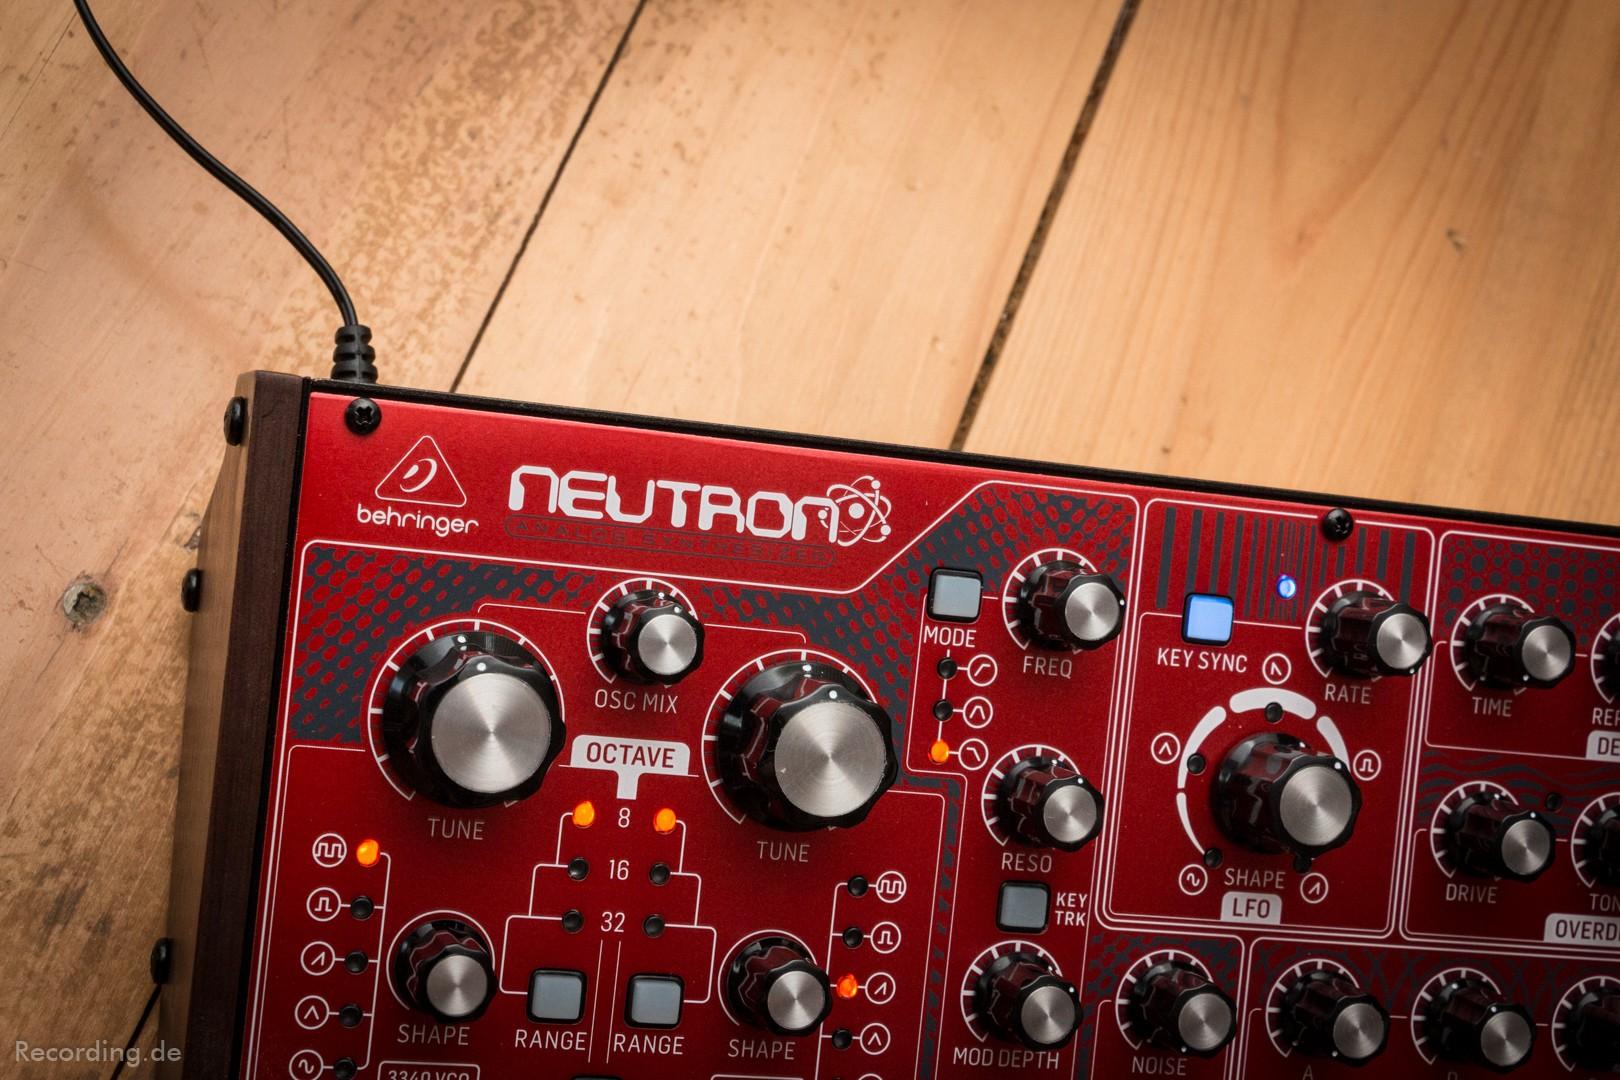 Neutron-015.jpg